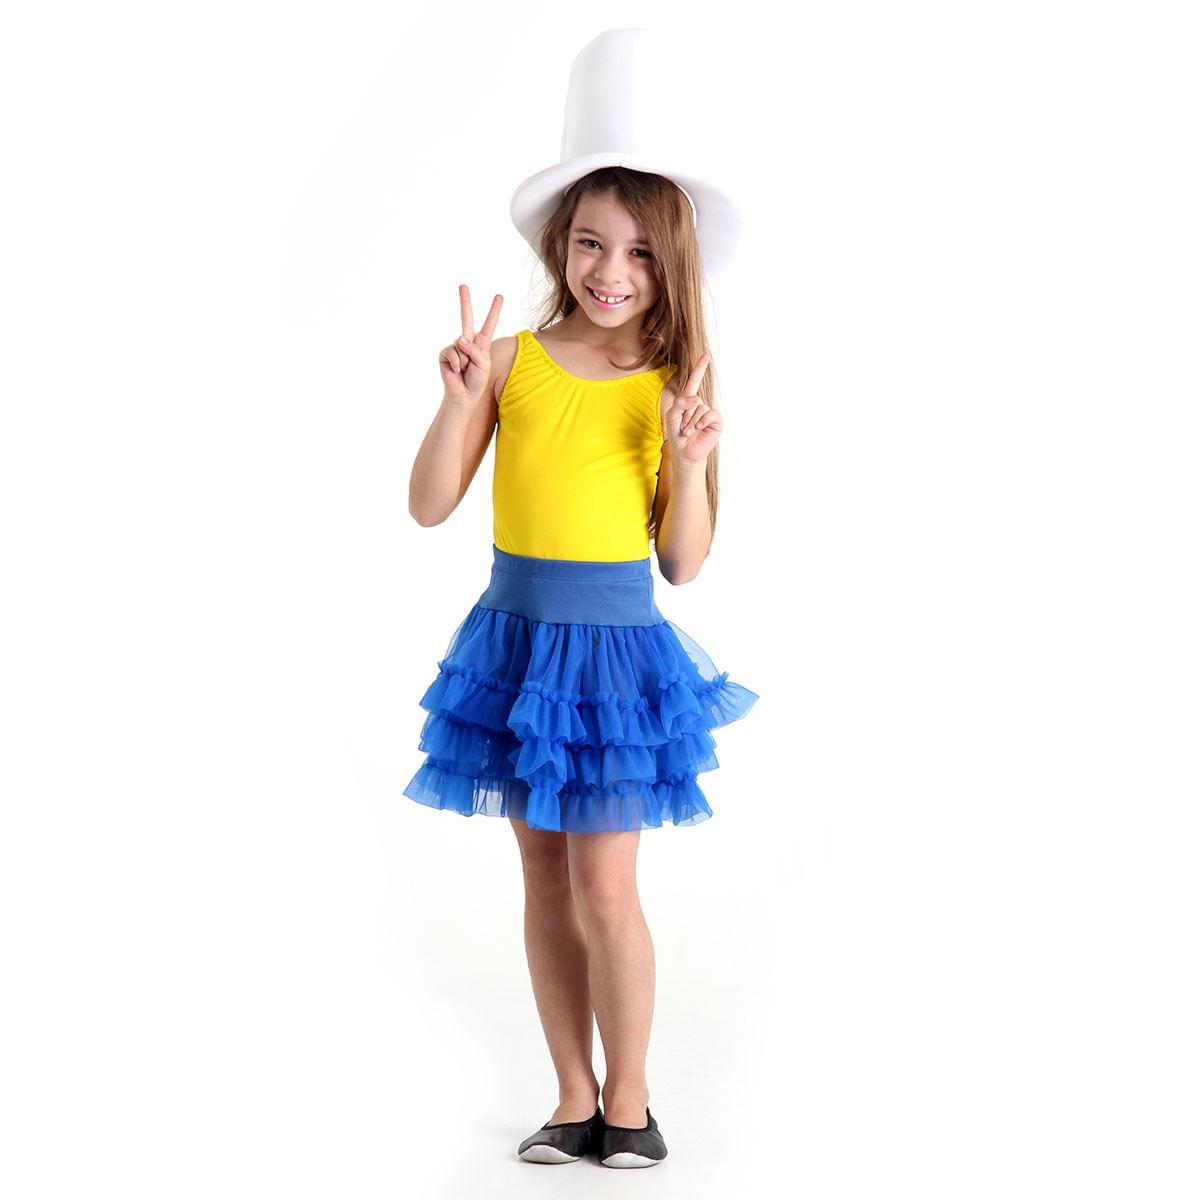 Fantasia Make Your Own - Saia Tutu Azul Infantil P